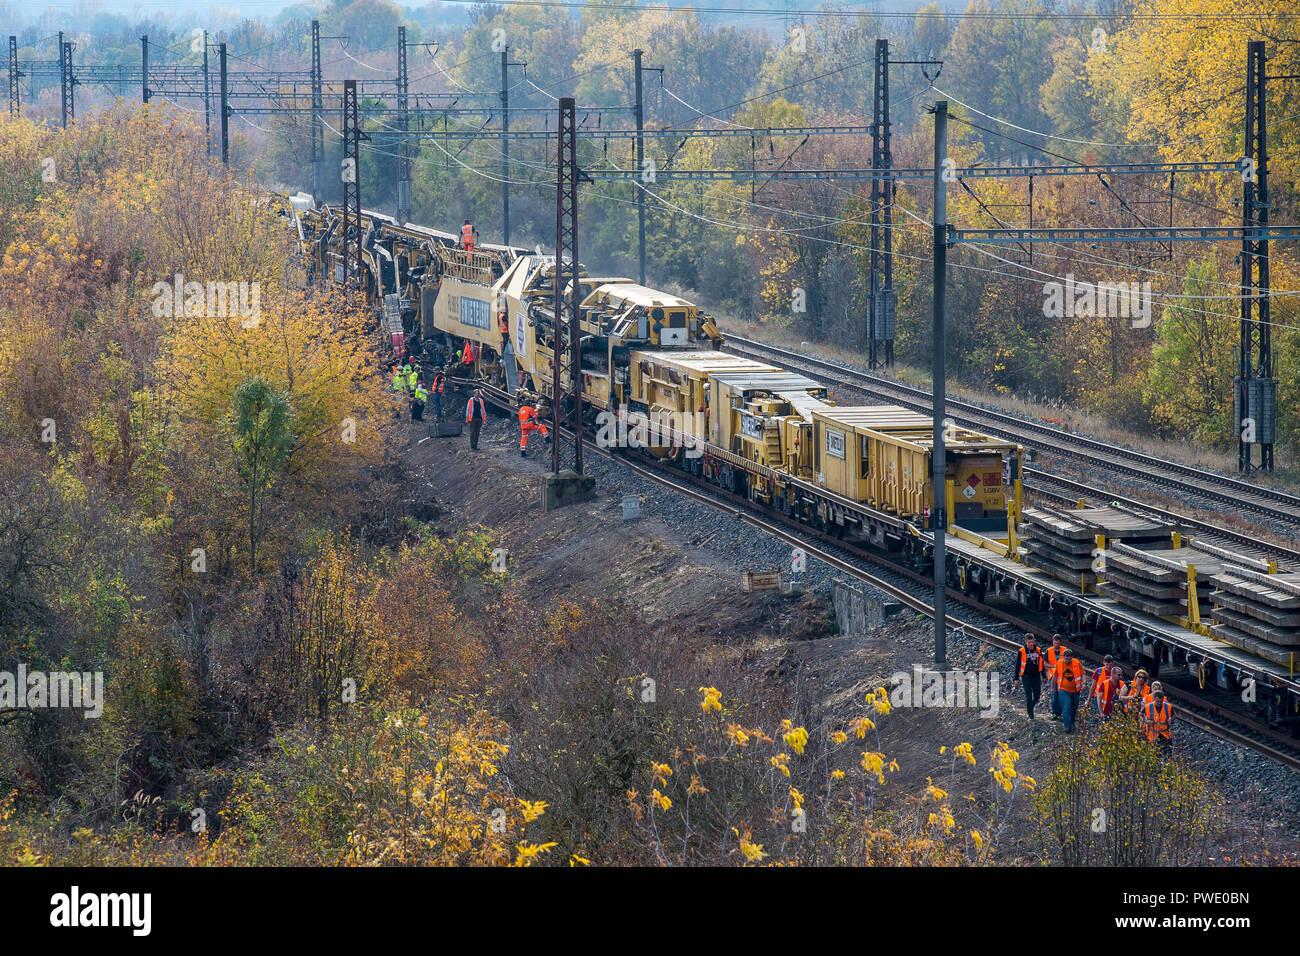 Railway Track Renewal Stock Photos & Railway Track Renewal